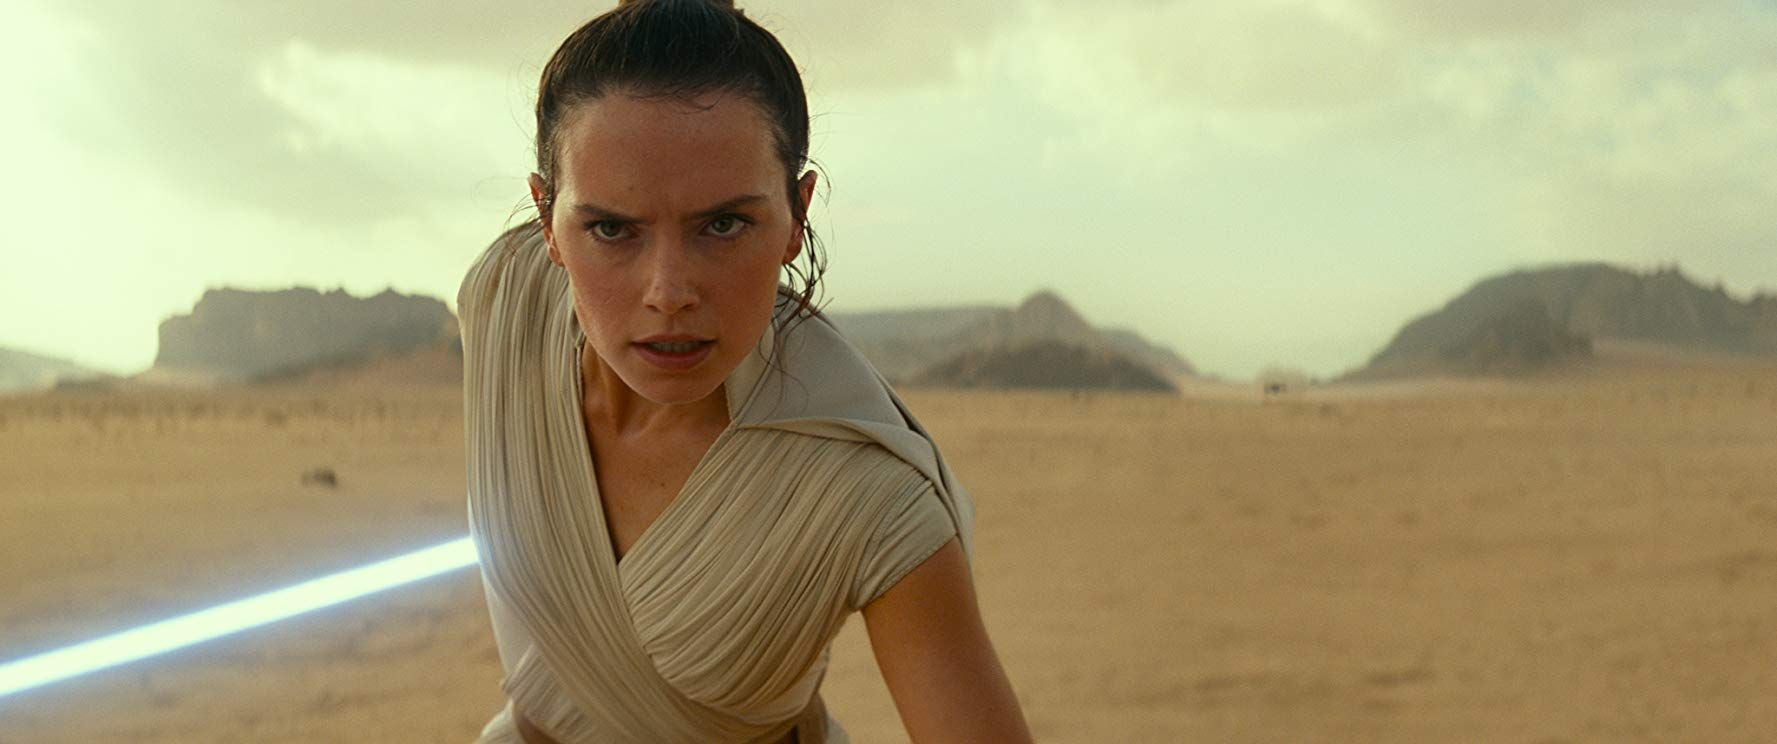 Imagen 11 de Star Wars: El Ascenso de Skywalker